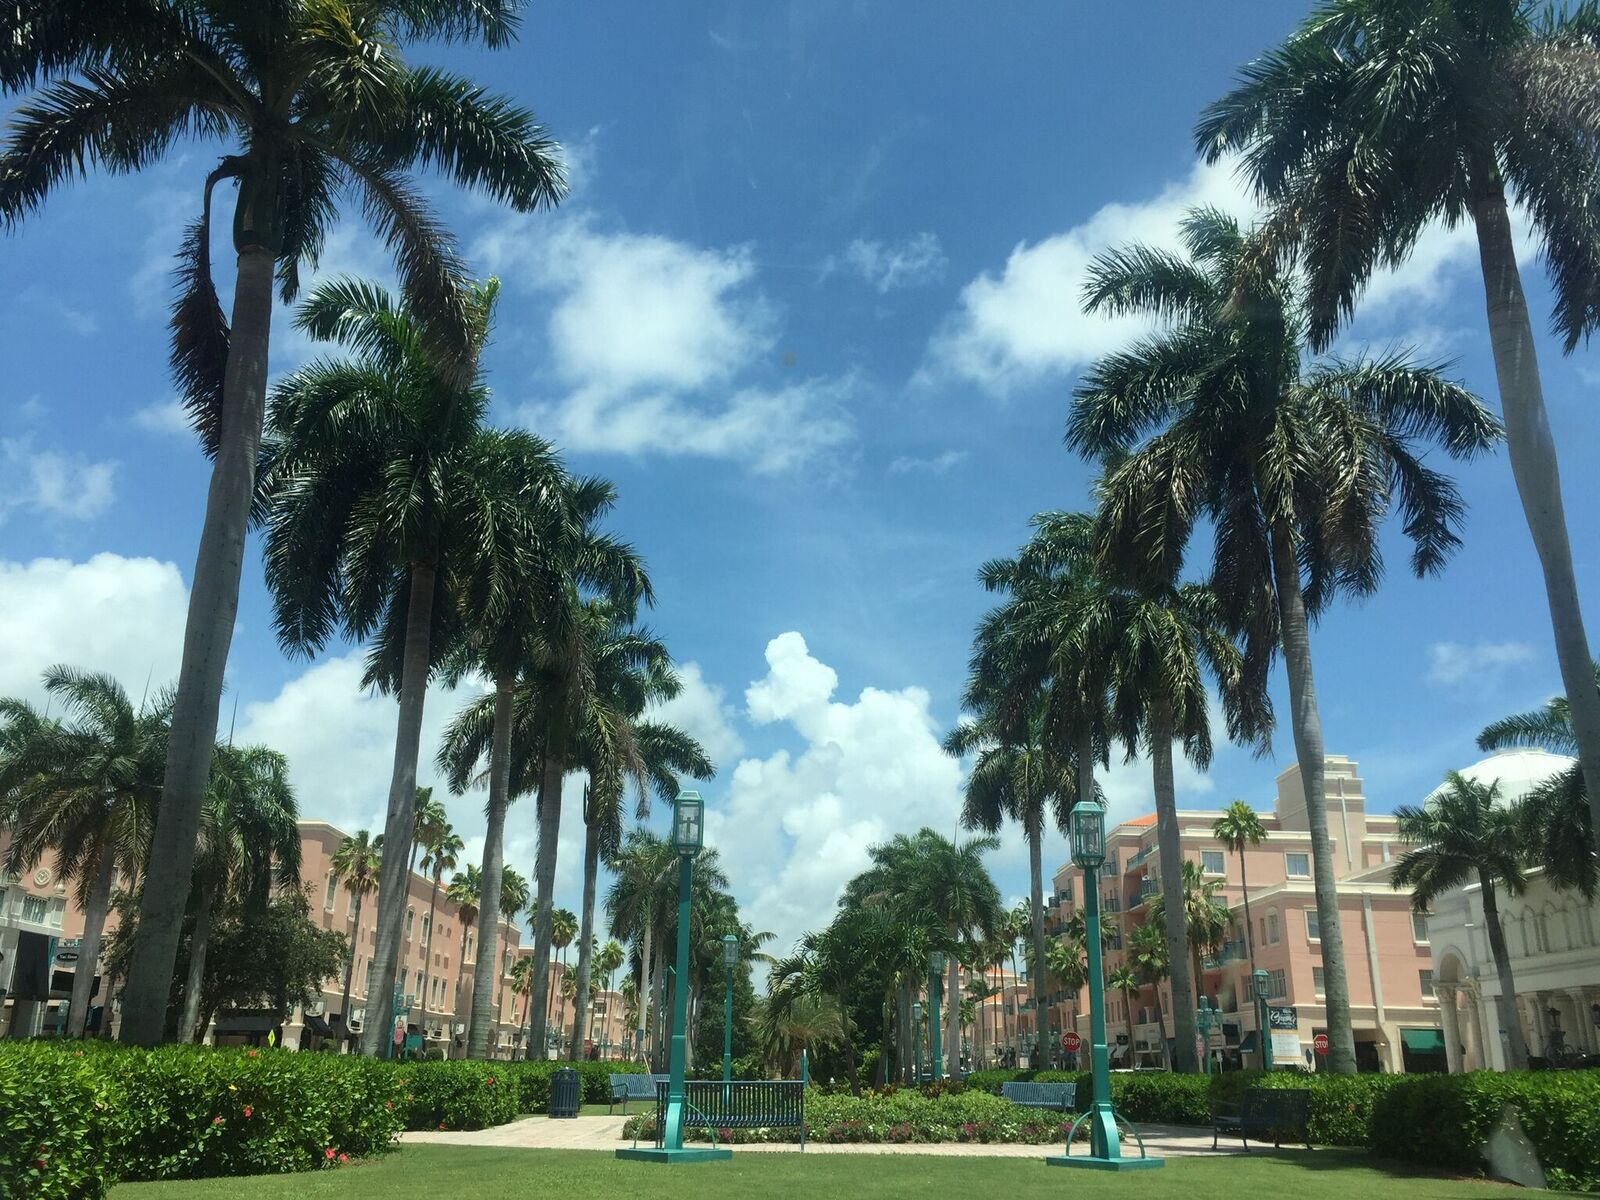 Things To Do Around Boca Raton